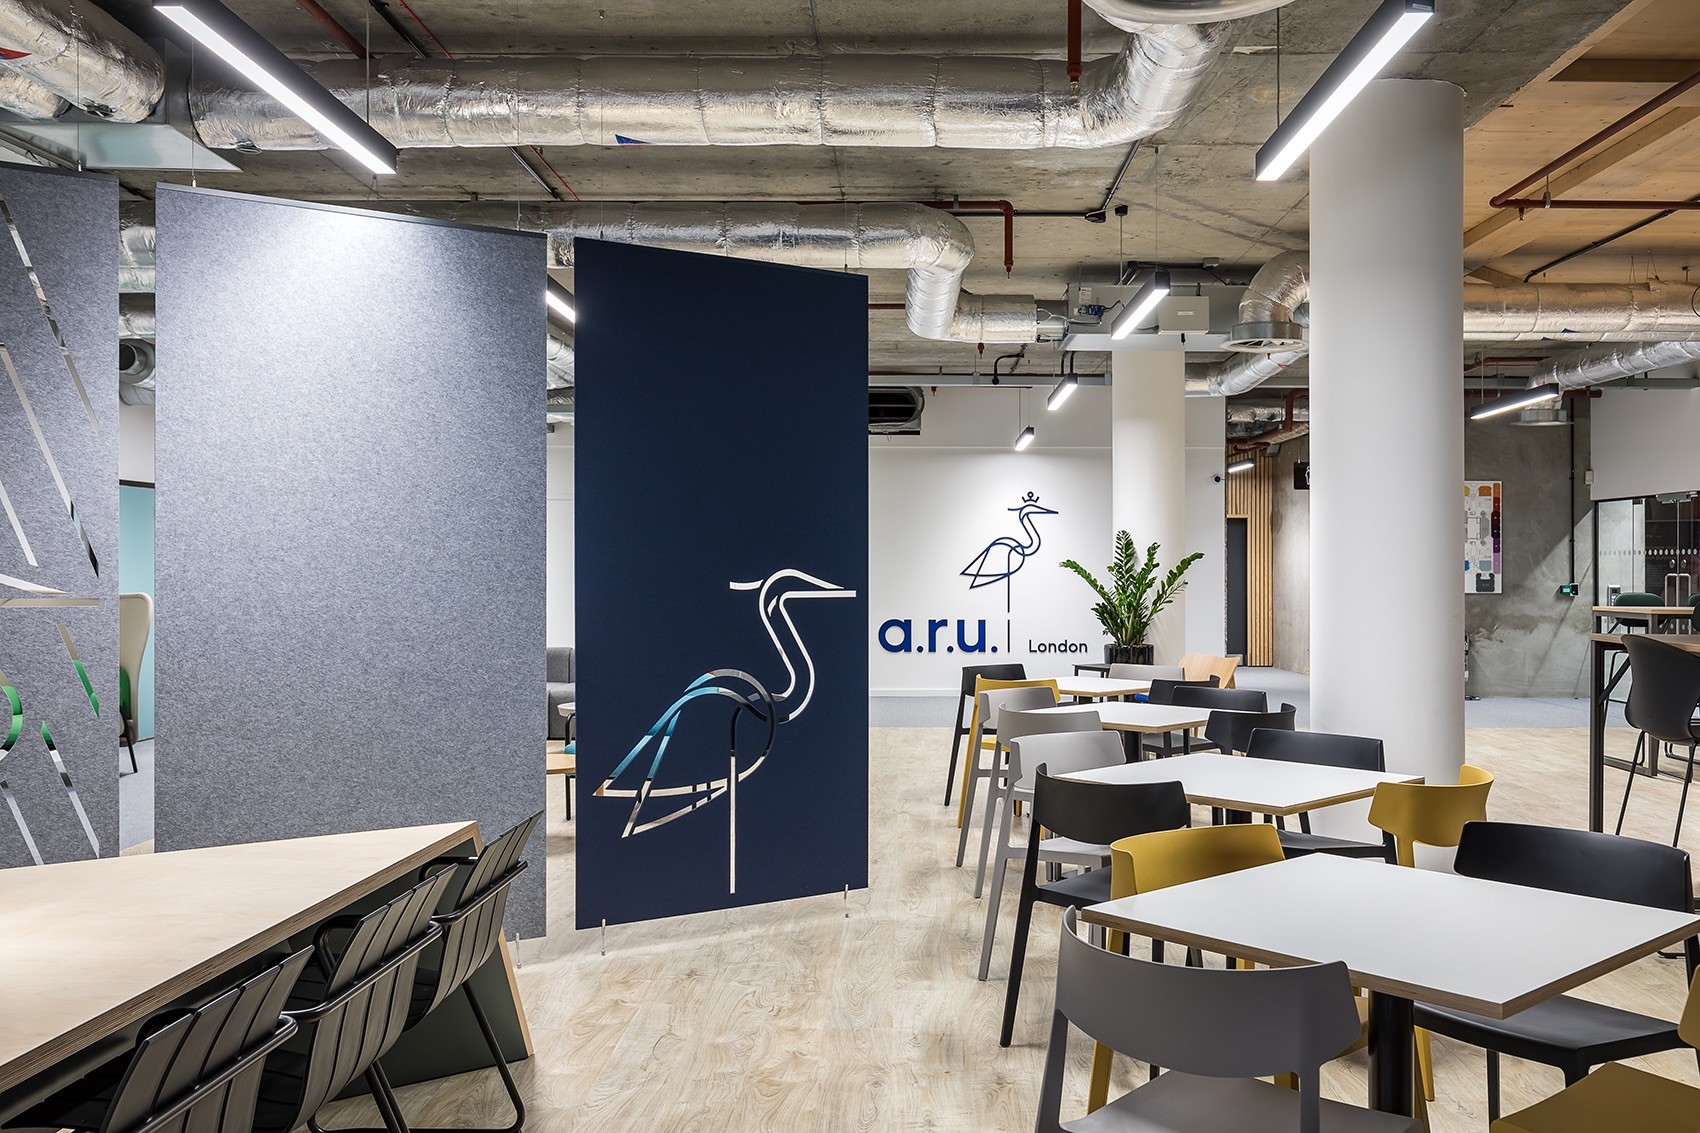 anglia-ruskin-university-office-london-10